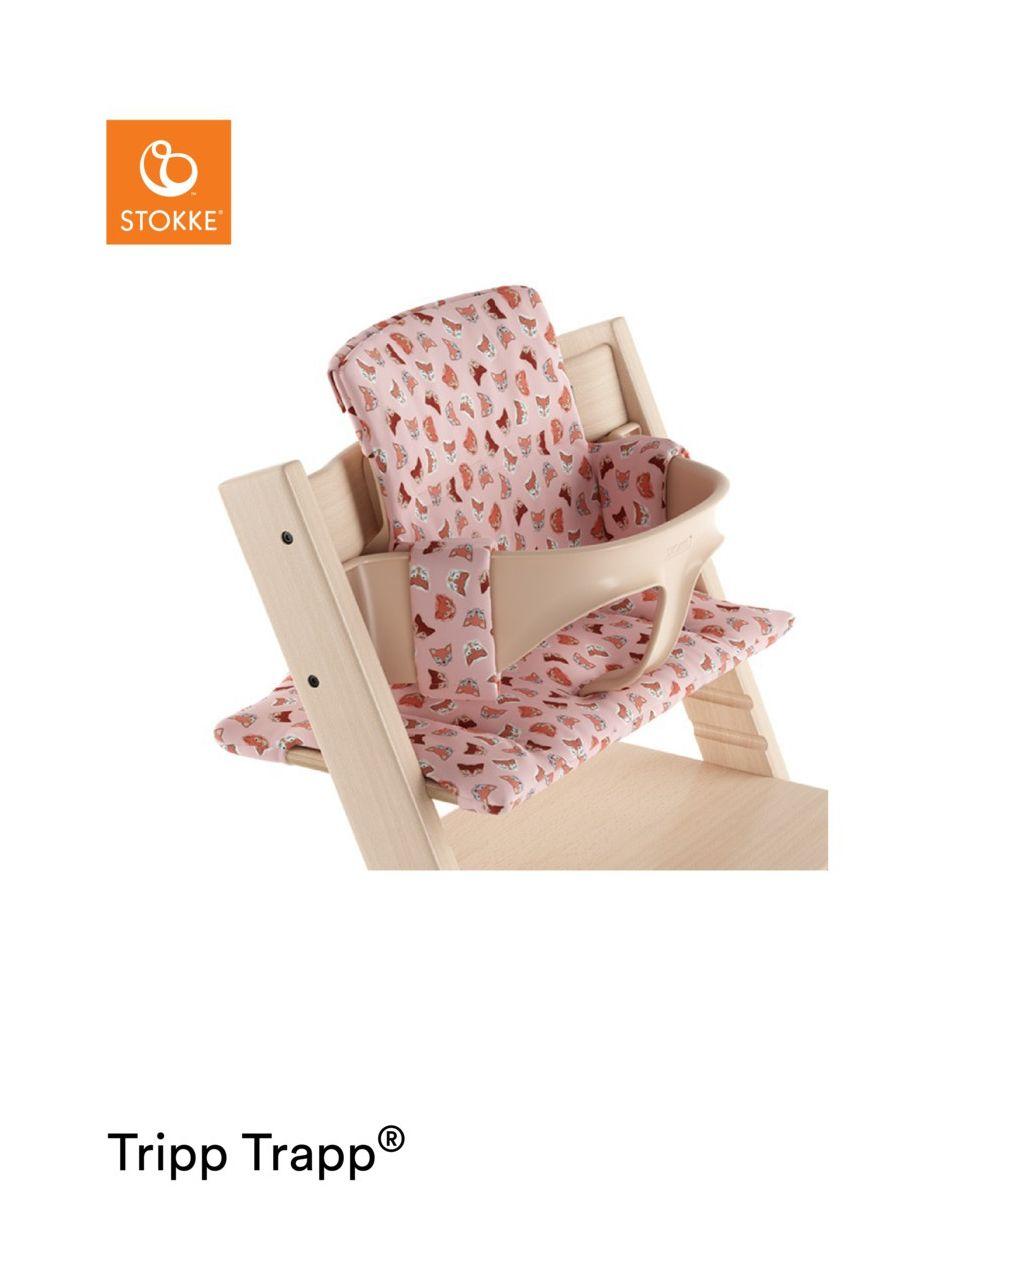 Tripp trapp® cuscino - raposa rosa - Stokke